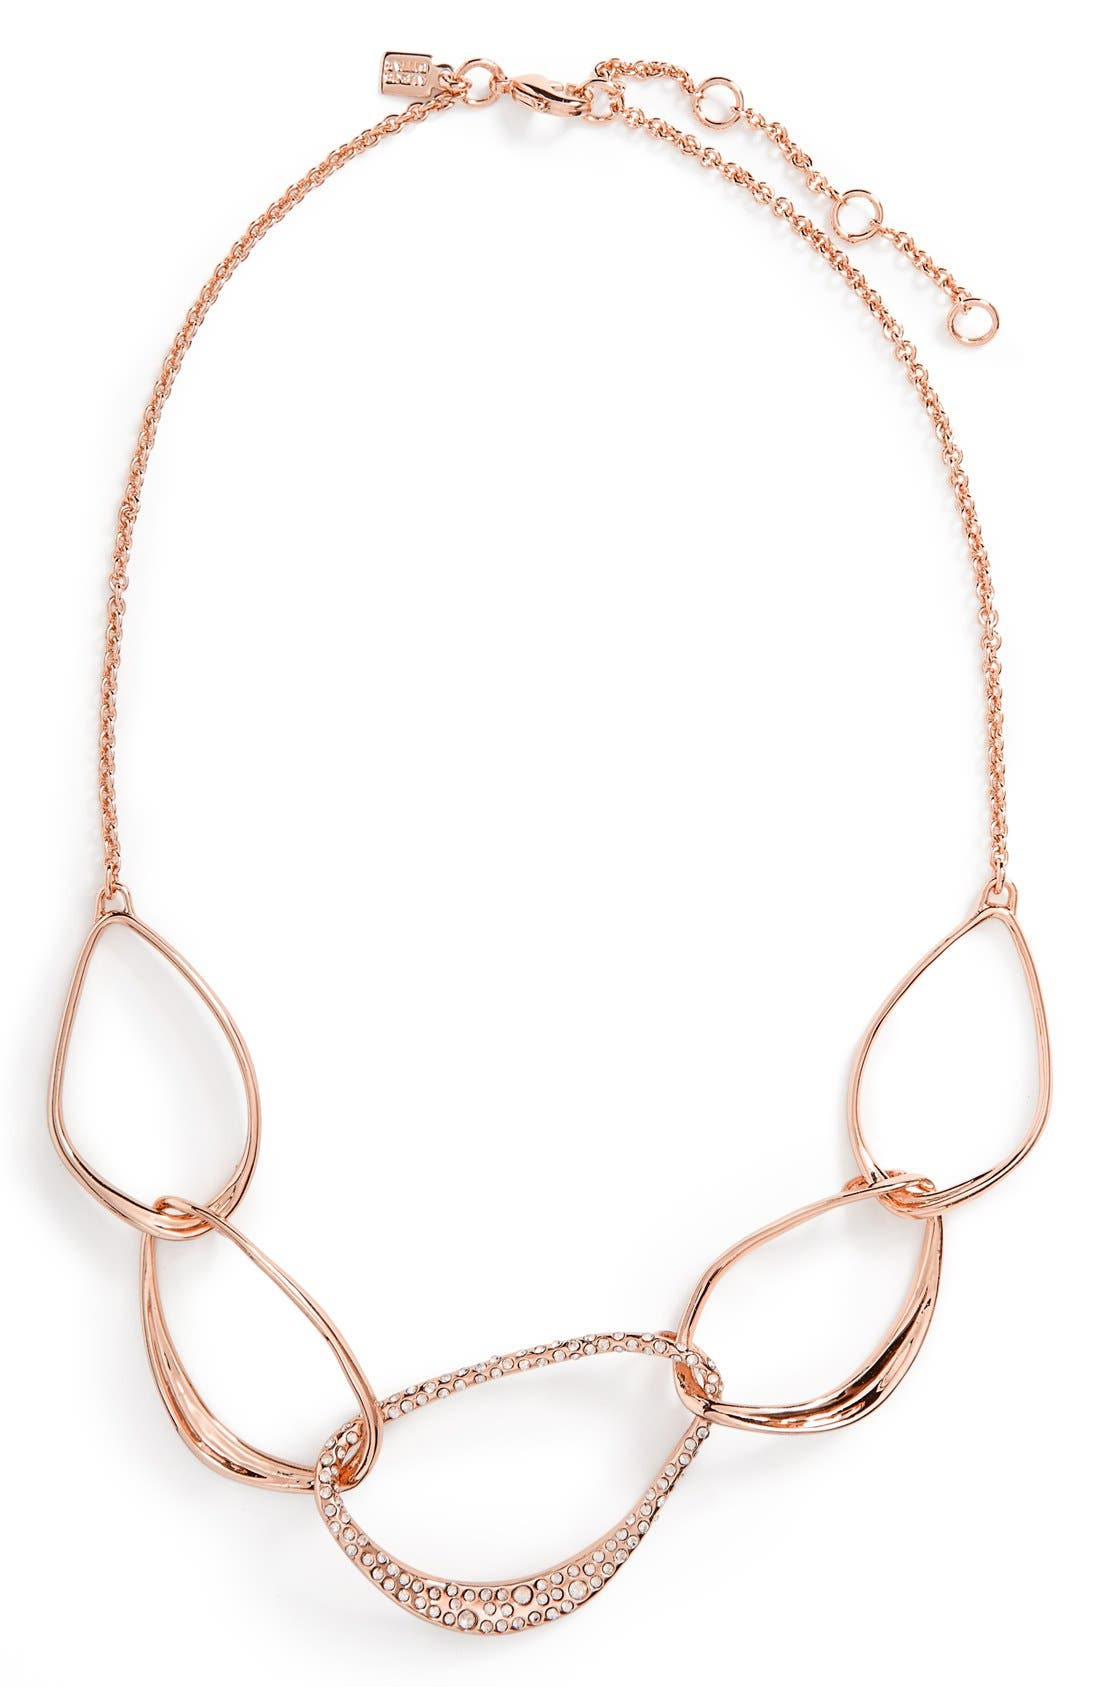 Main Image - Alexis Bittar 'Miss Havisham' Link Bib Necklace